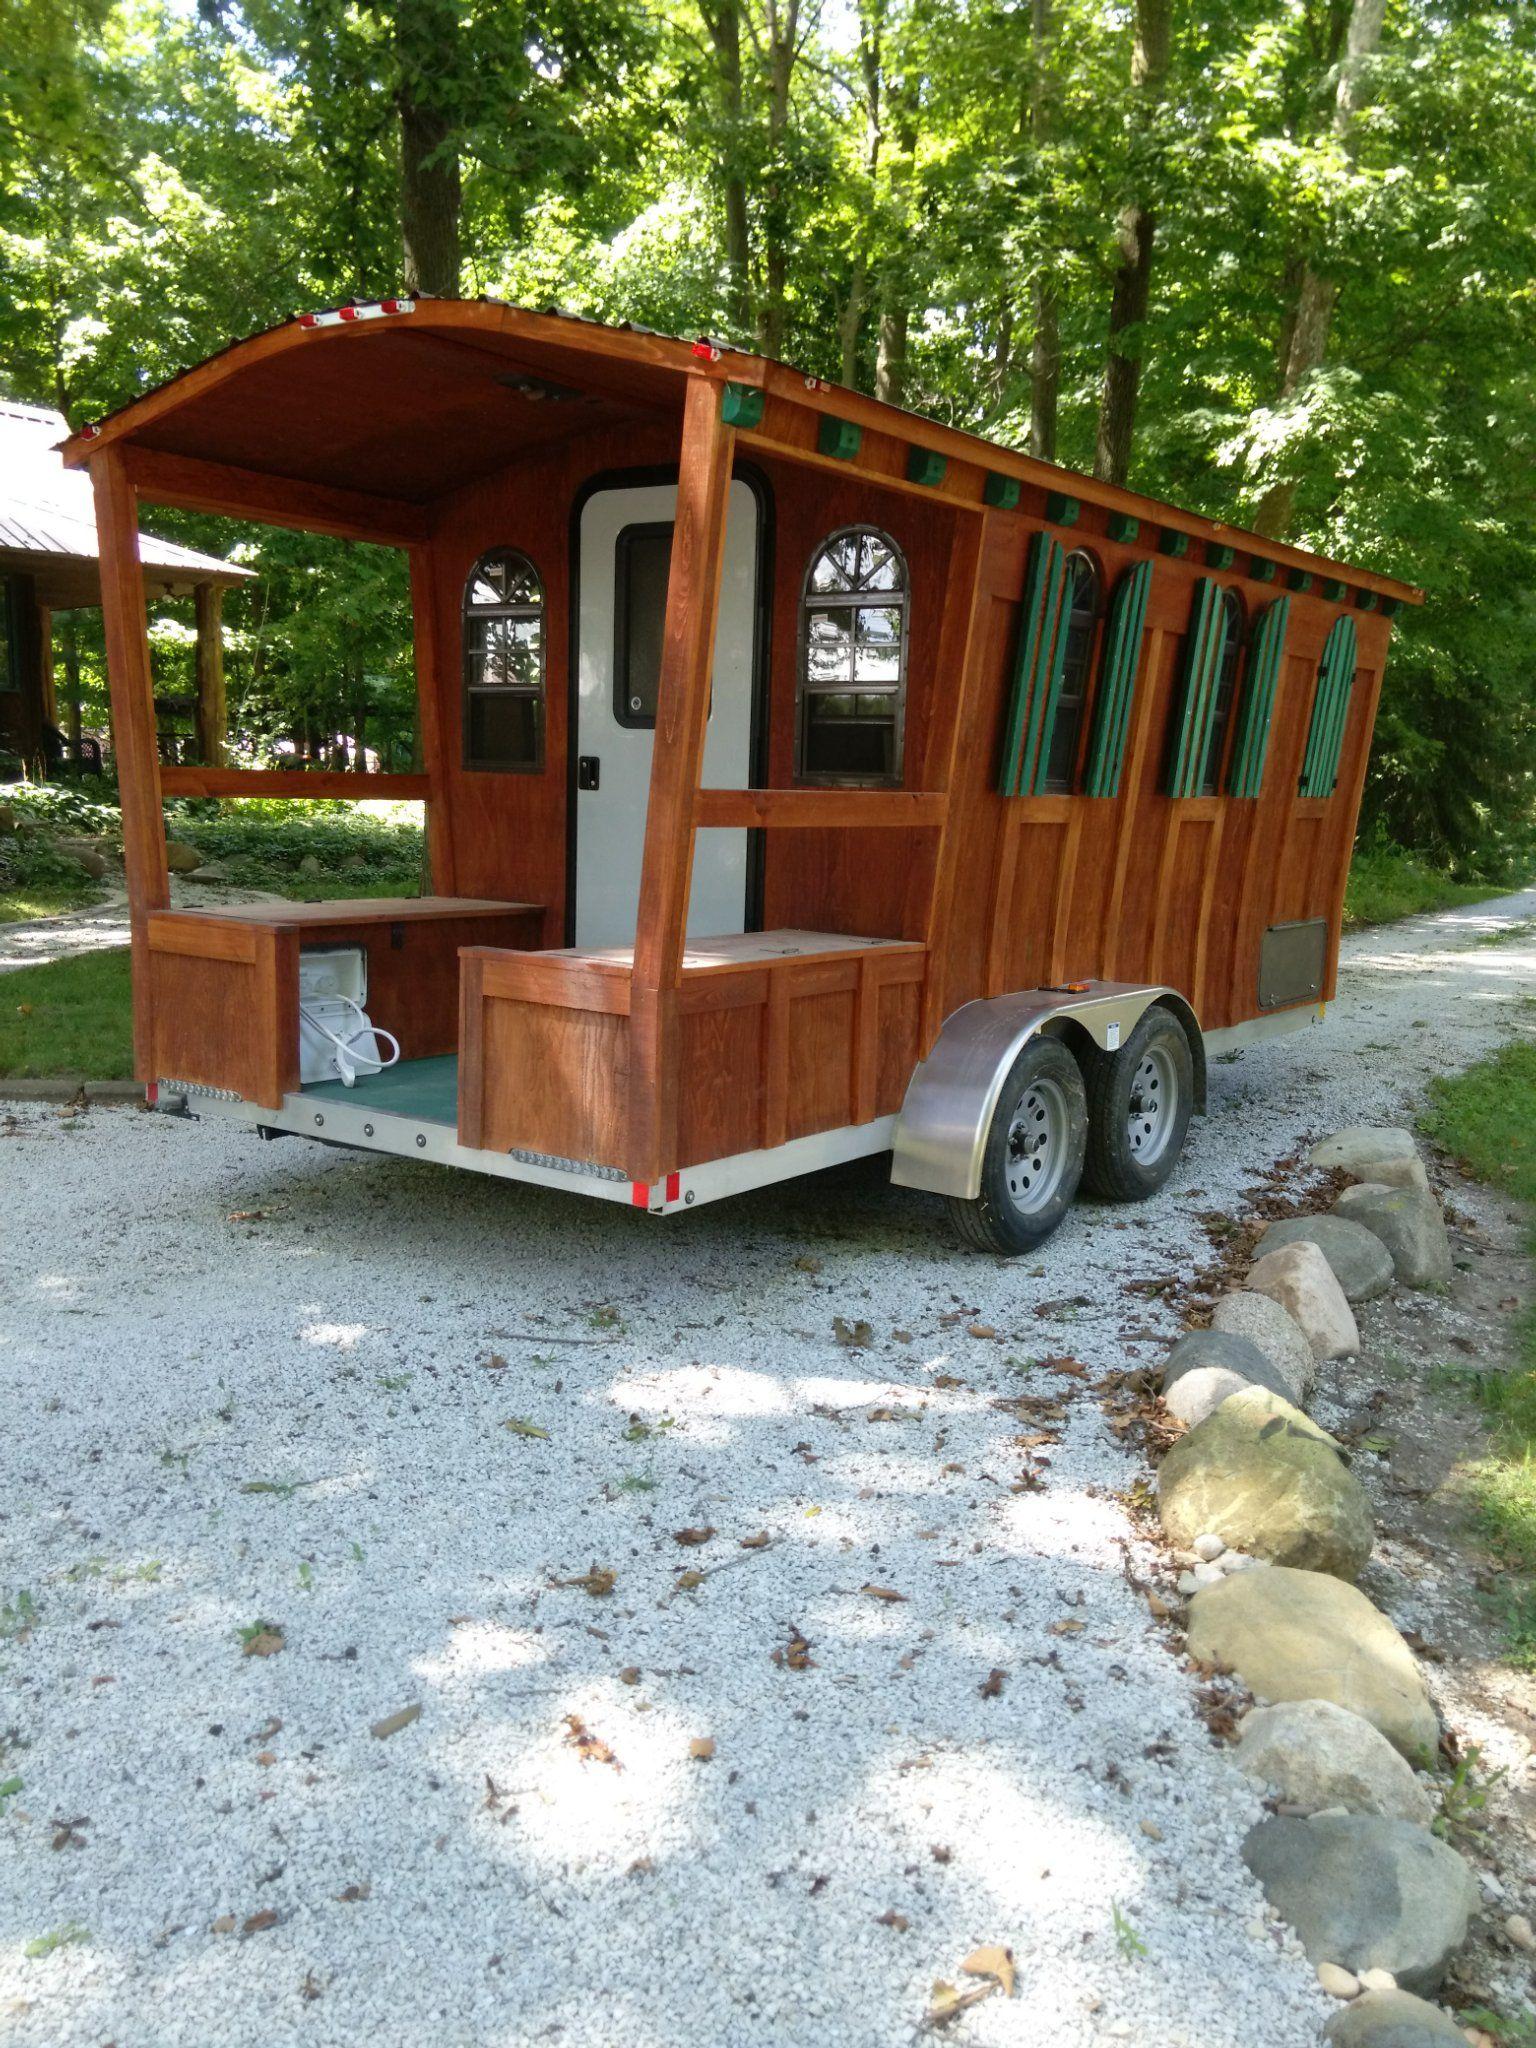 Pin on Vintage Campers Trailers and Caravans